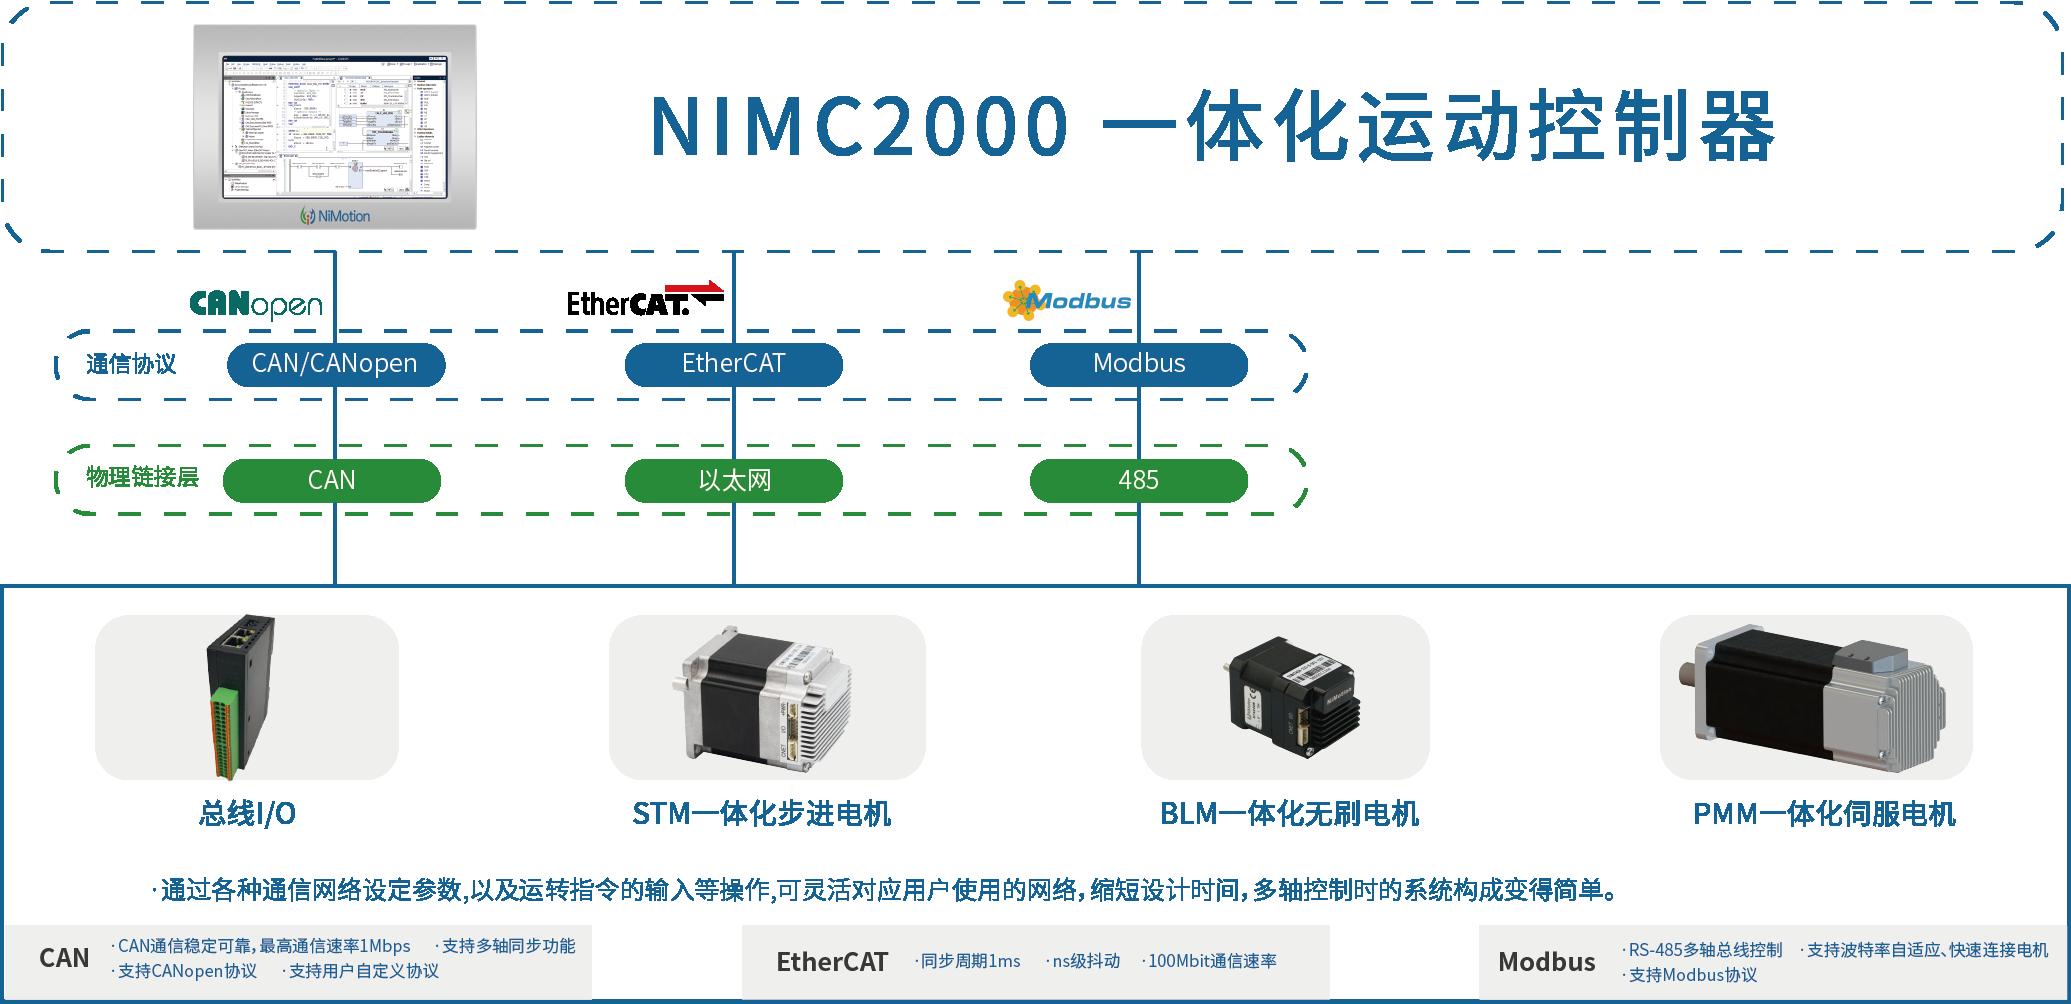 NIMC2000 一体化控制器